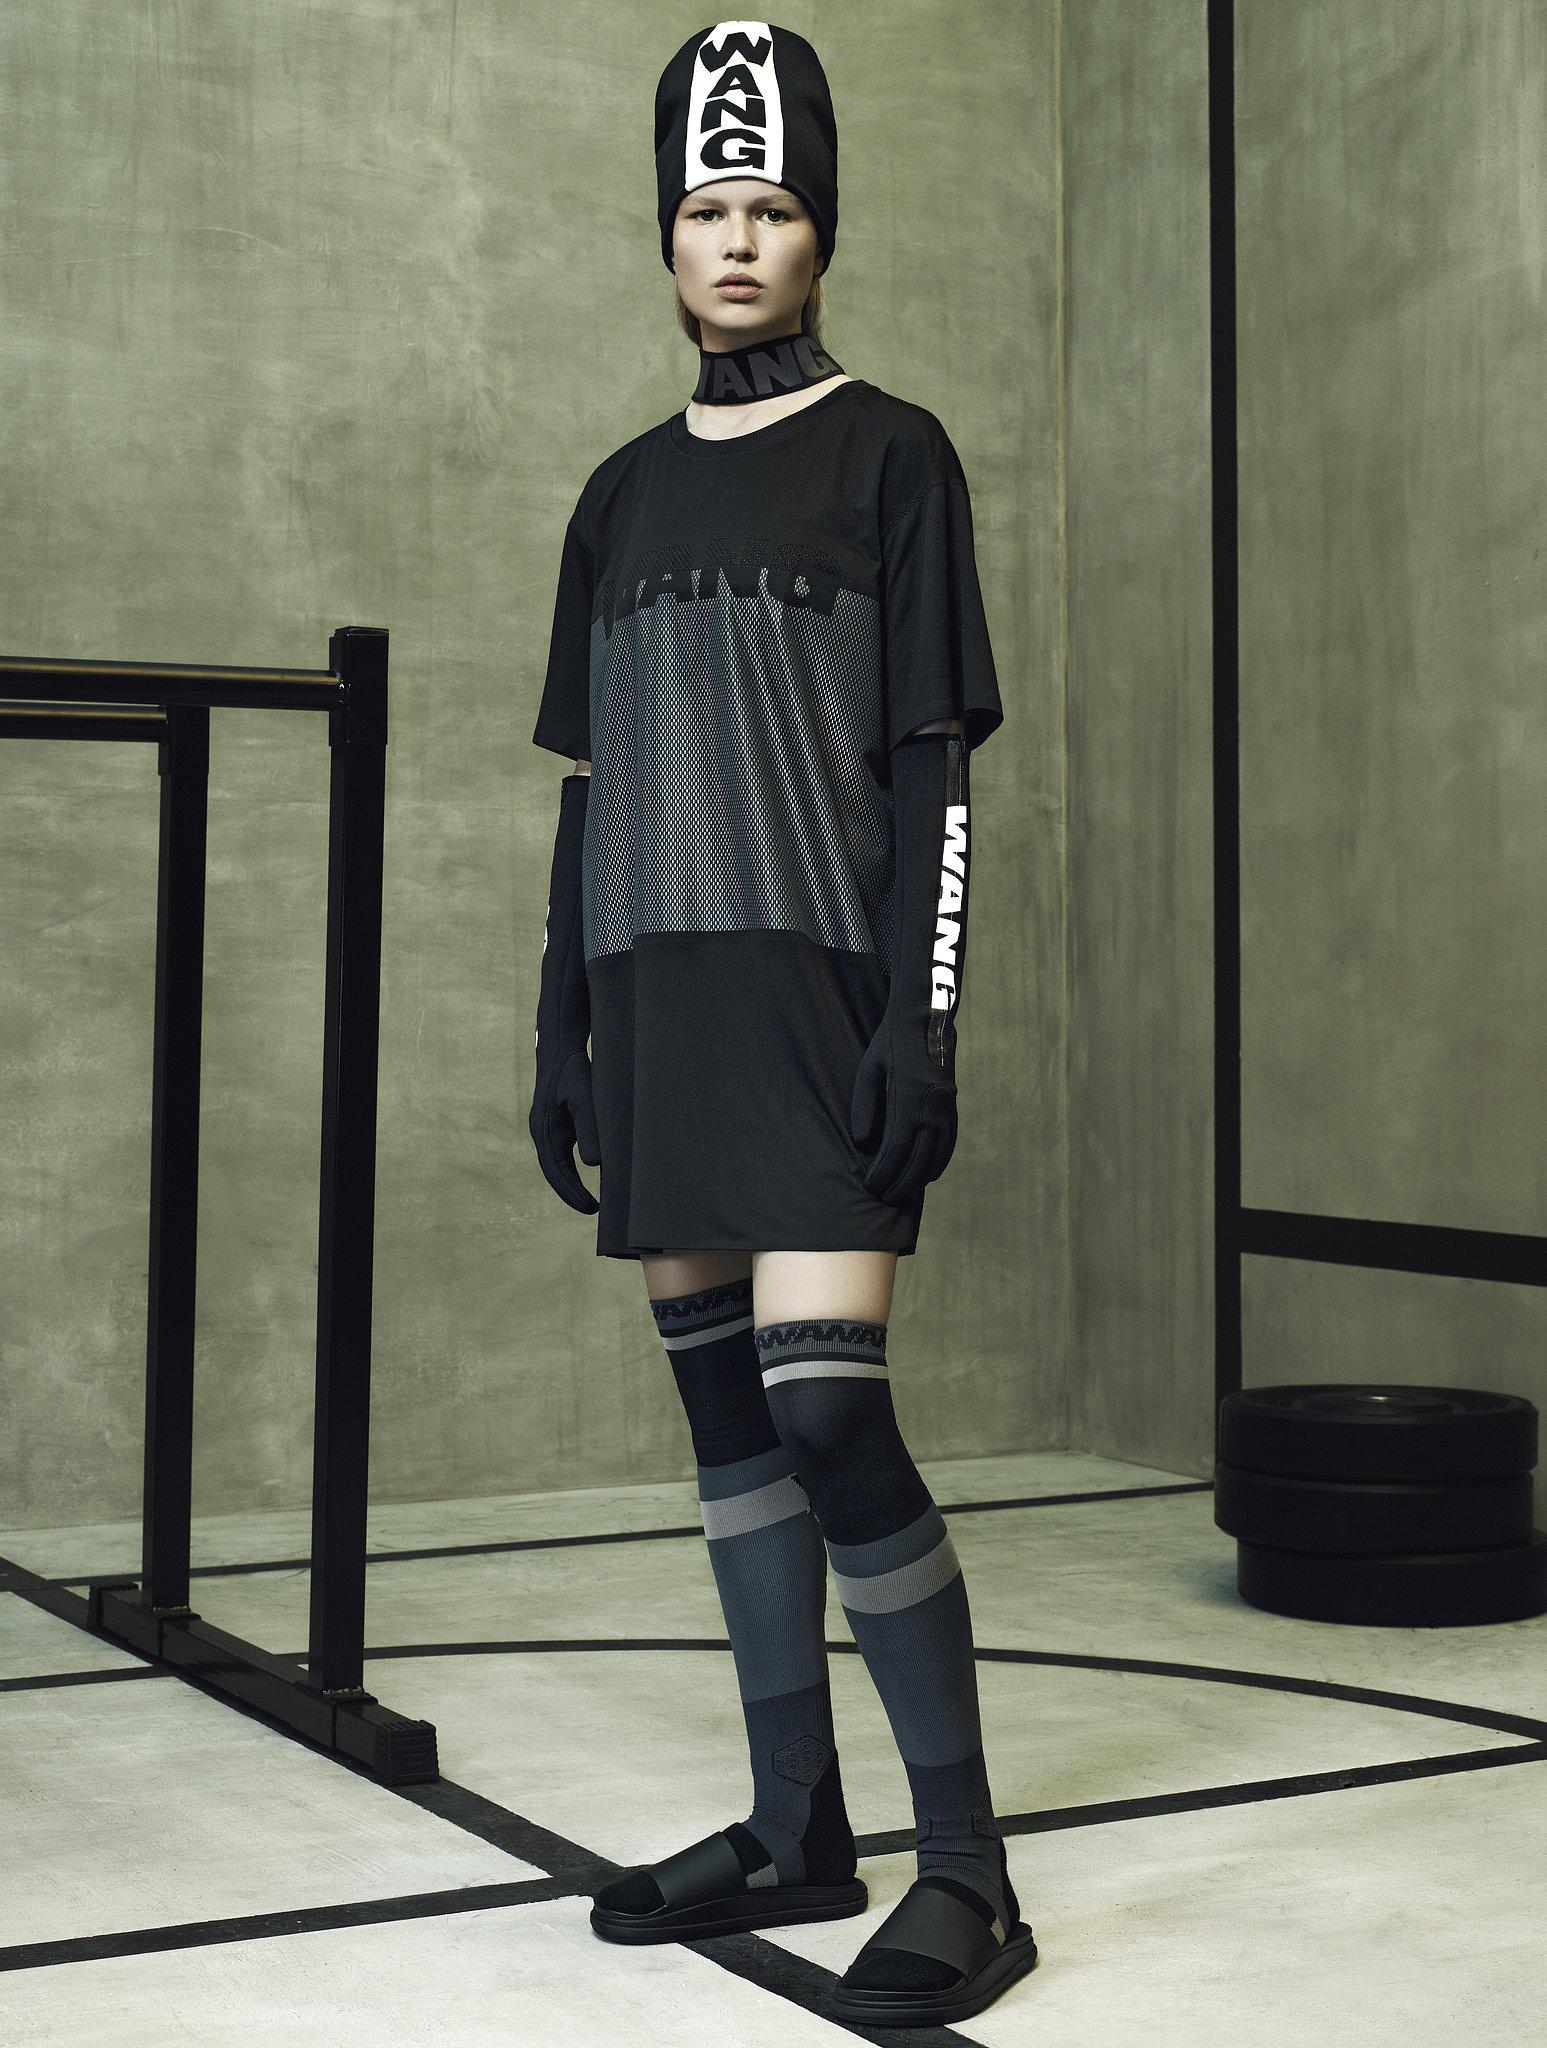 Alexander Wang x HM. likes. Alexander Wang X H&M Designer Collaboration.